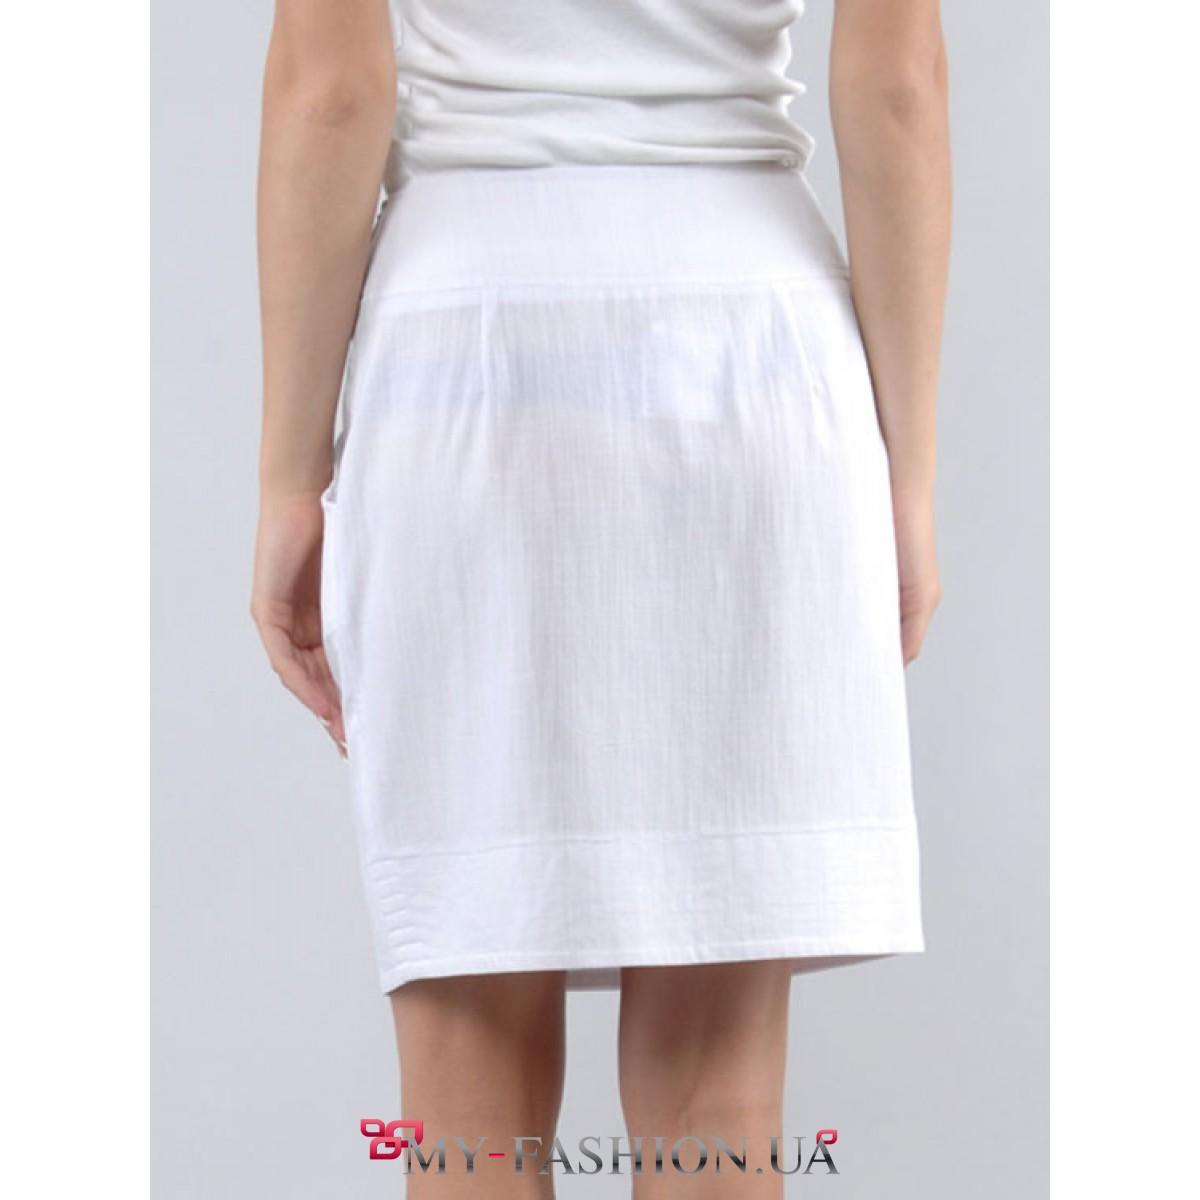 Короткая белая юбка